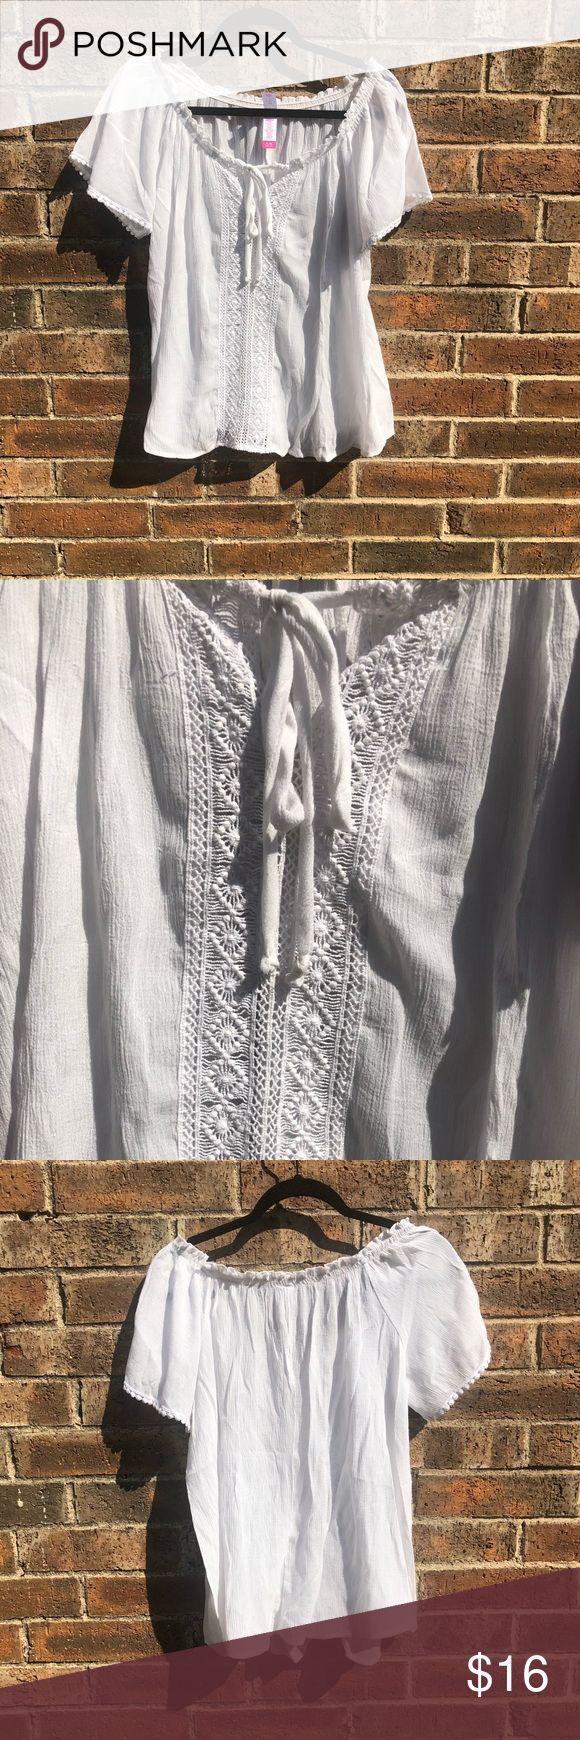 White Spanish Style Shirt 46% rayon  39% polyester  15% cotton No Boundaries Tops Tees - Short Sleeve